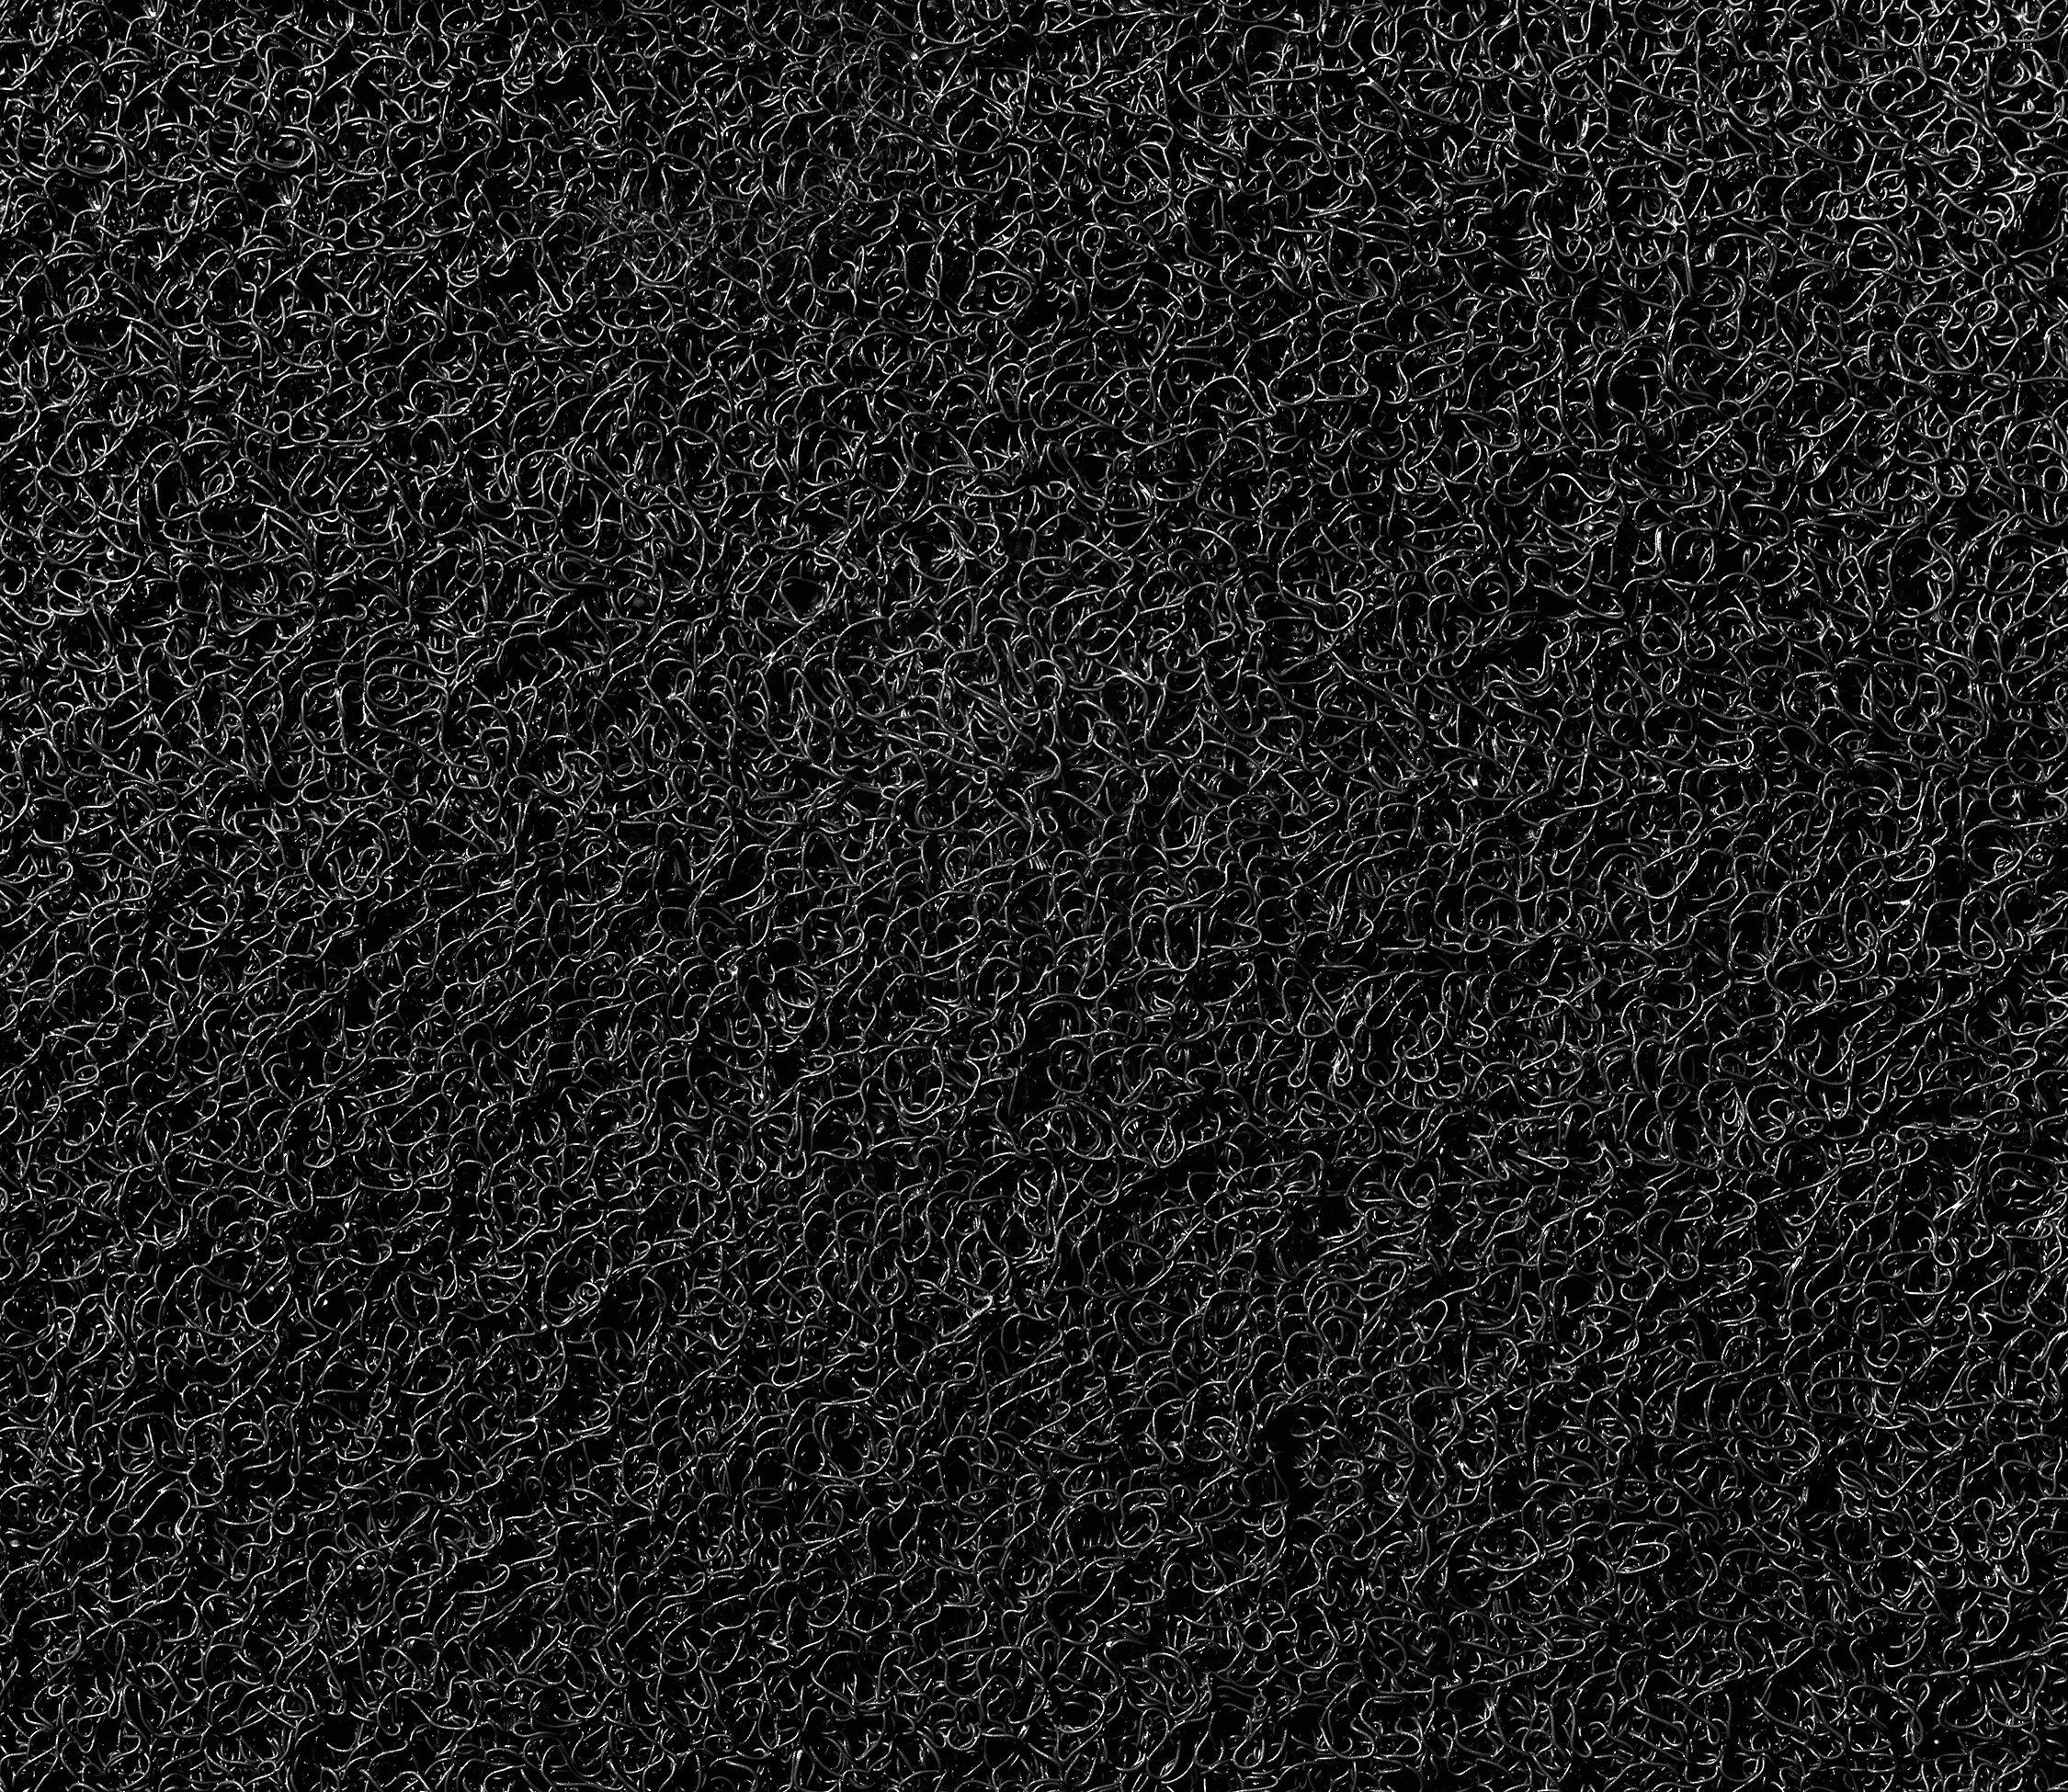 3M Nomad Heavy Traffic Backed Scraper Matting 8150, Black 4' x 6'